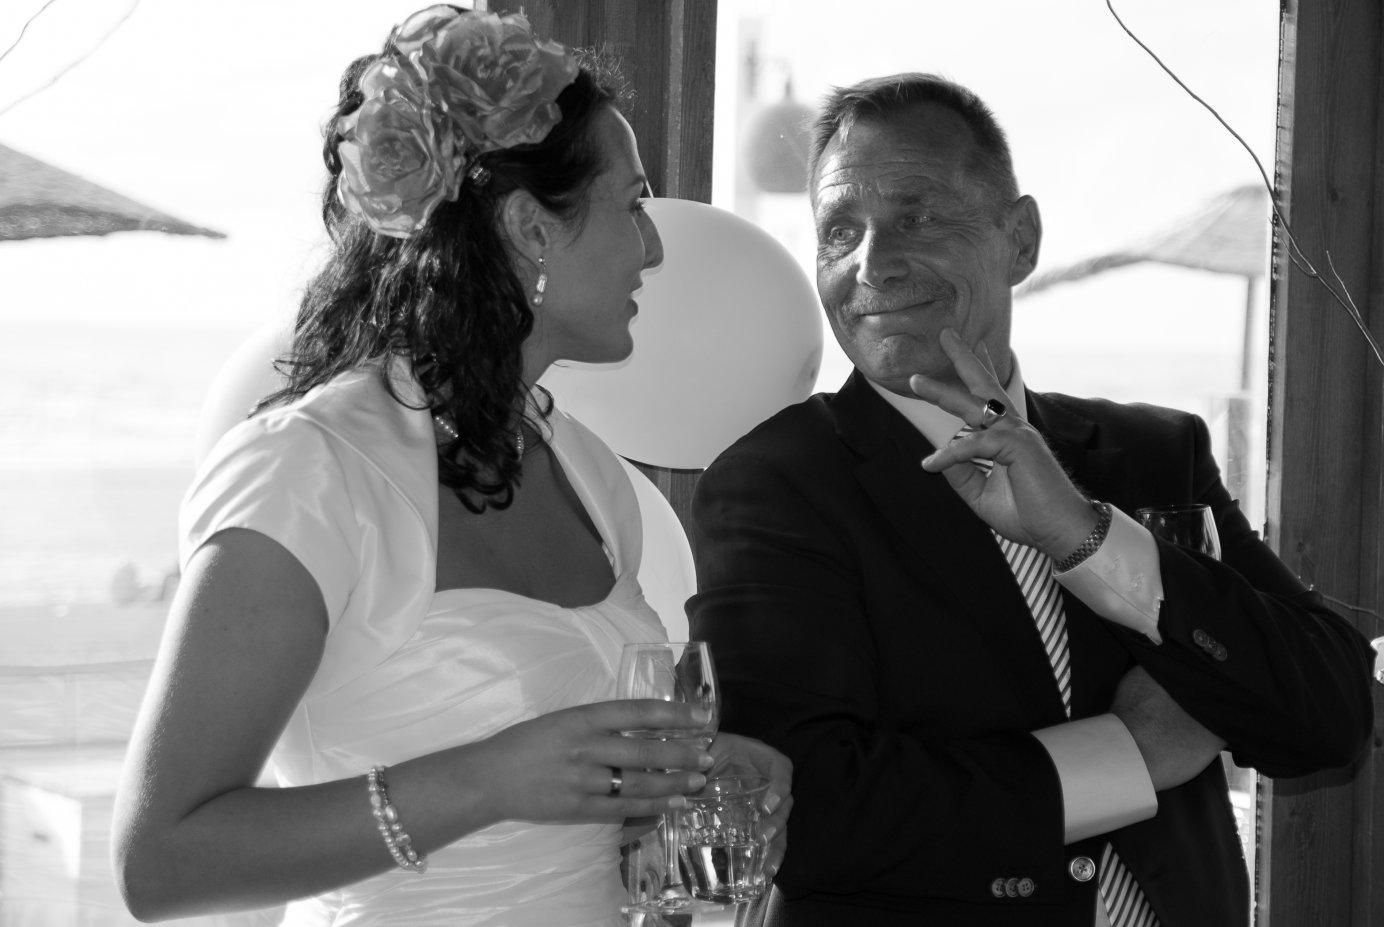 sven, fotografie, bruiloft, trouwen, Almere, fotograaf